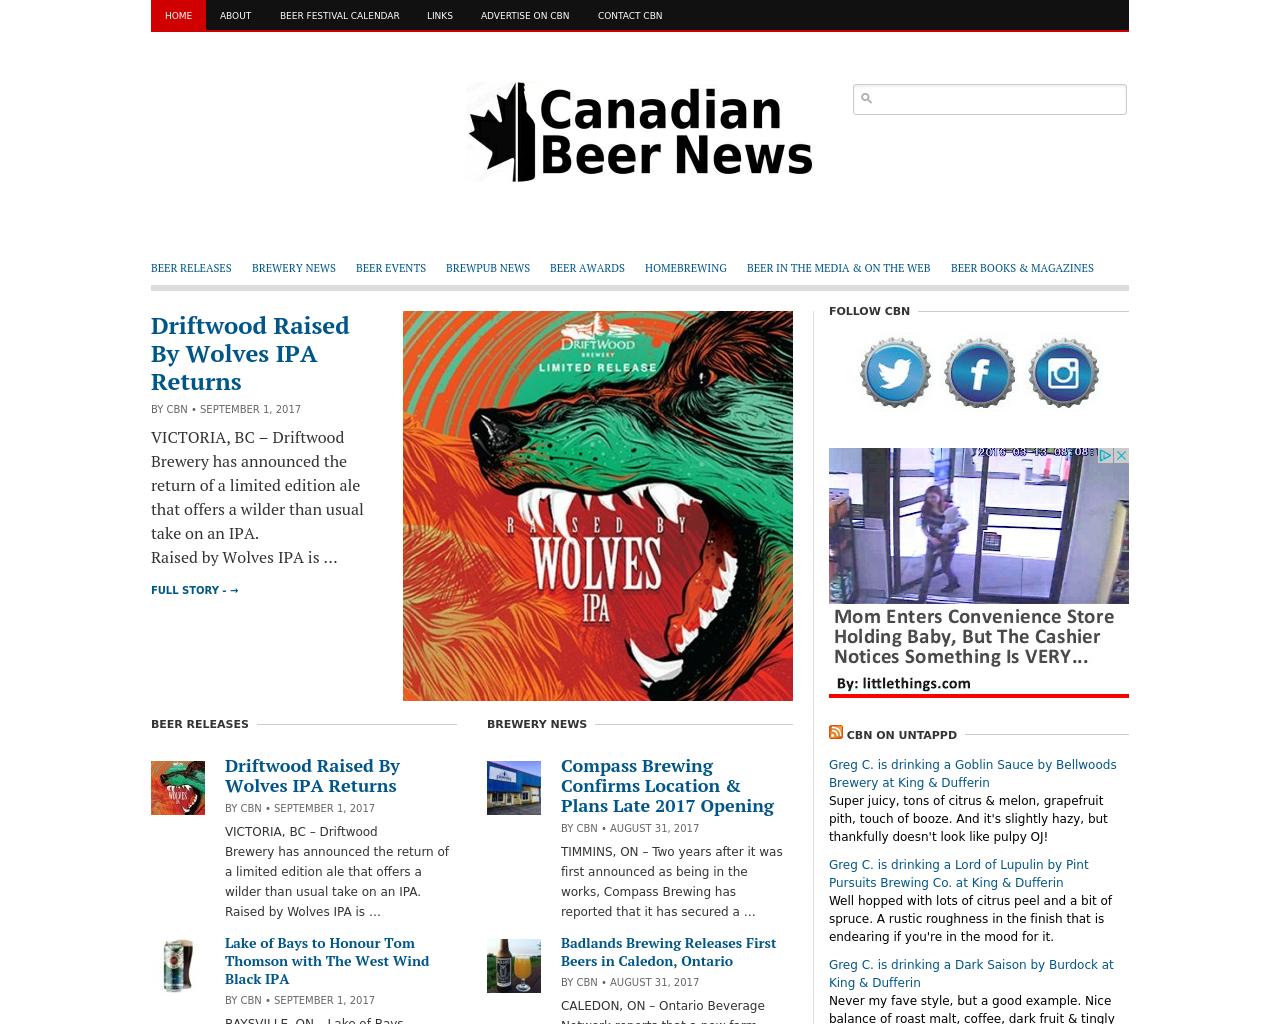 Canadian-Beer-News-Advertising-Reviews-Pricing